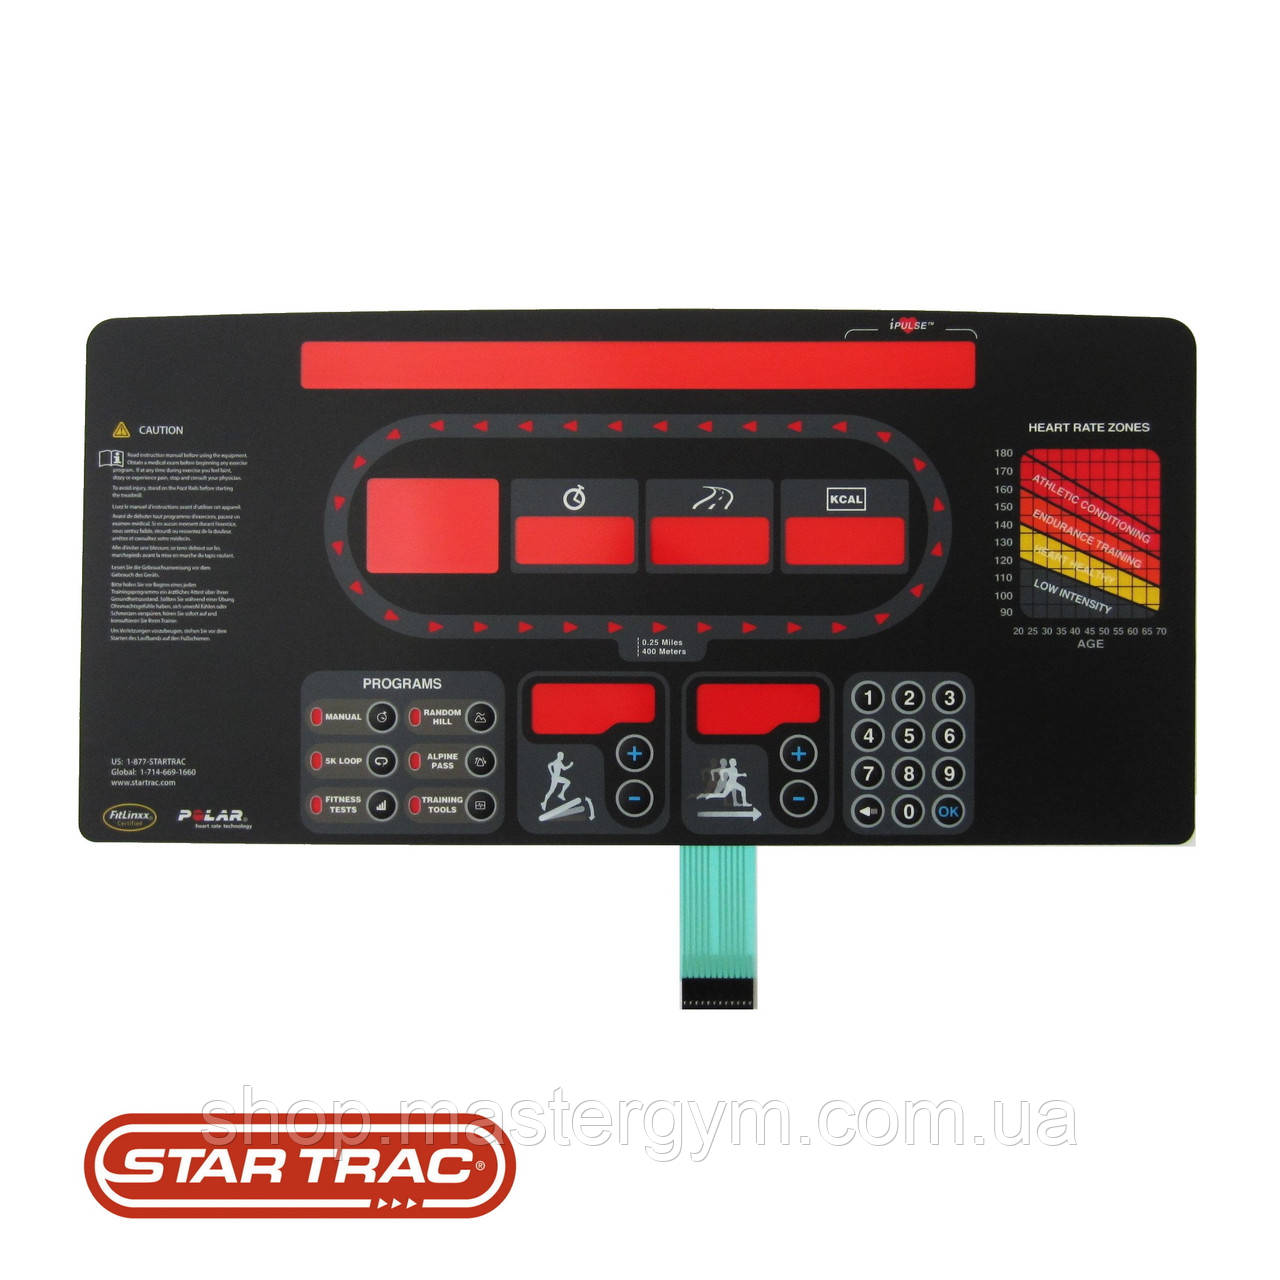 Накладка клавиатуры дисплея Star Trac E-TRx Gen2